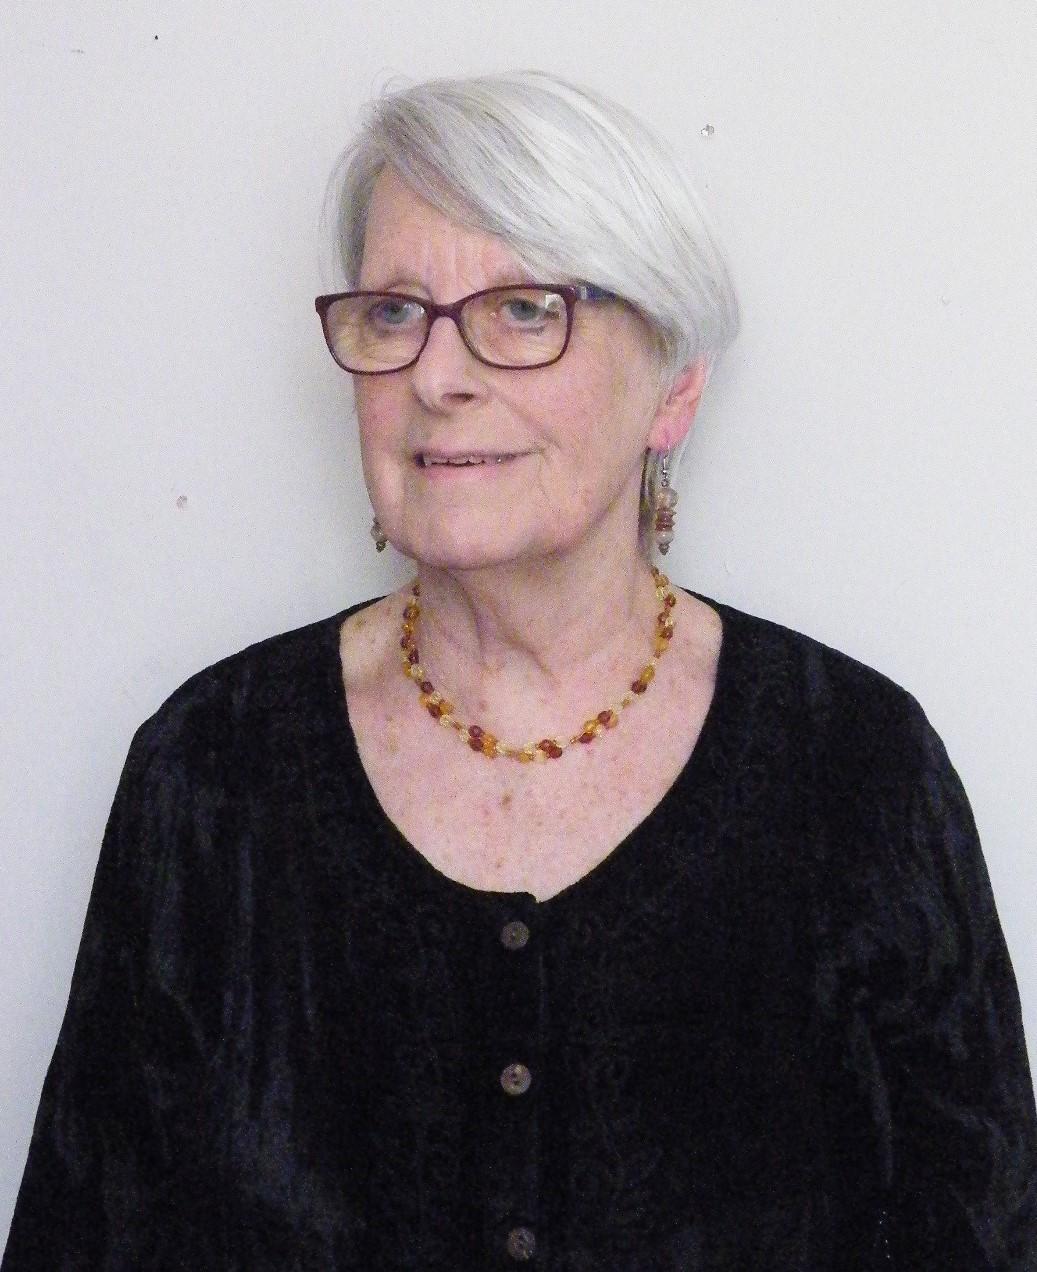 Veronica Phillips